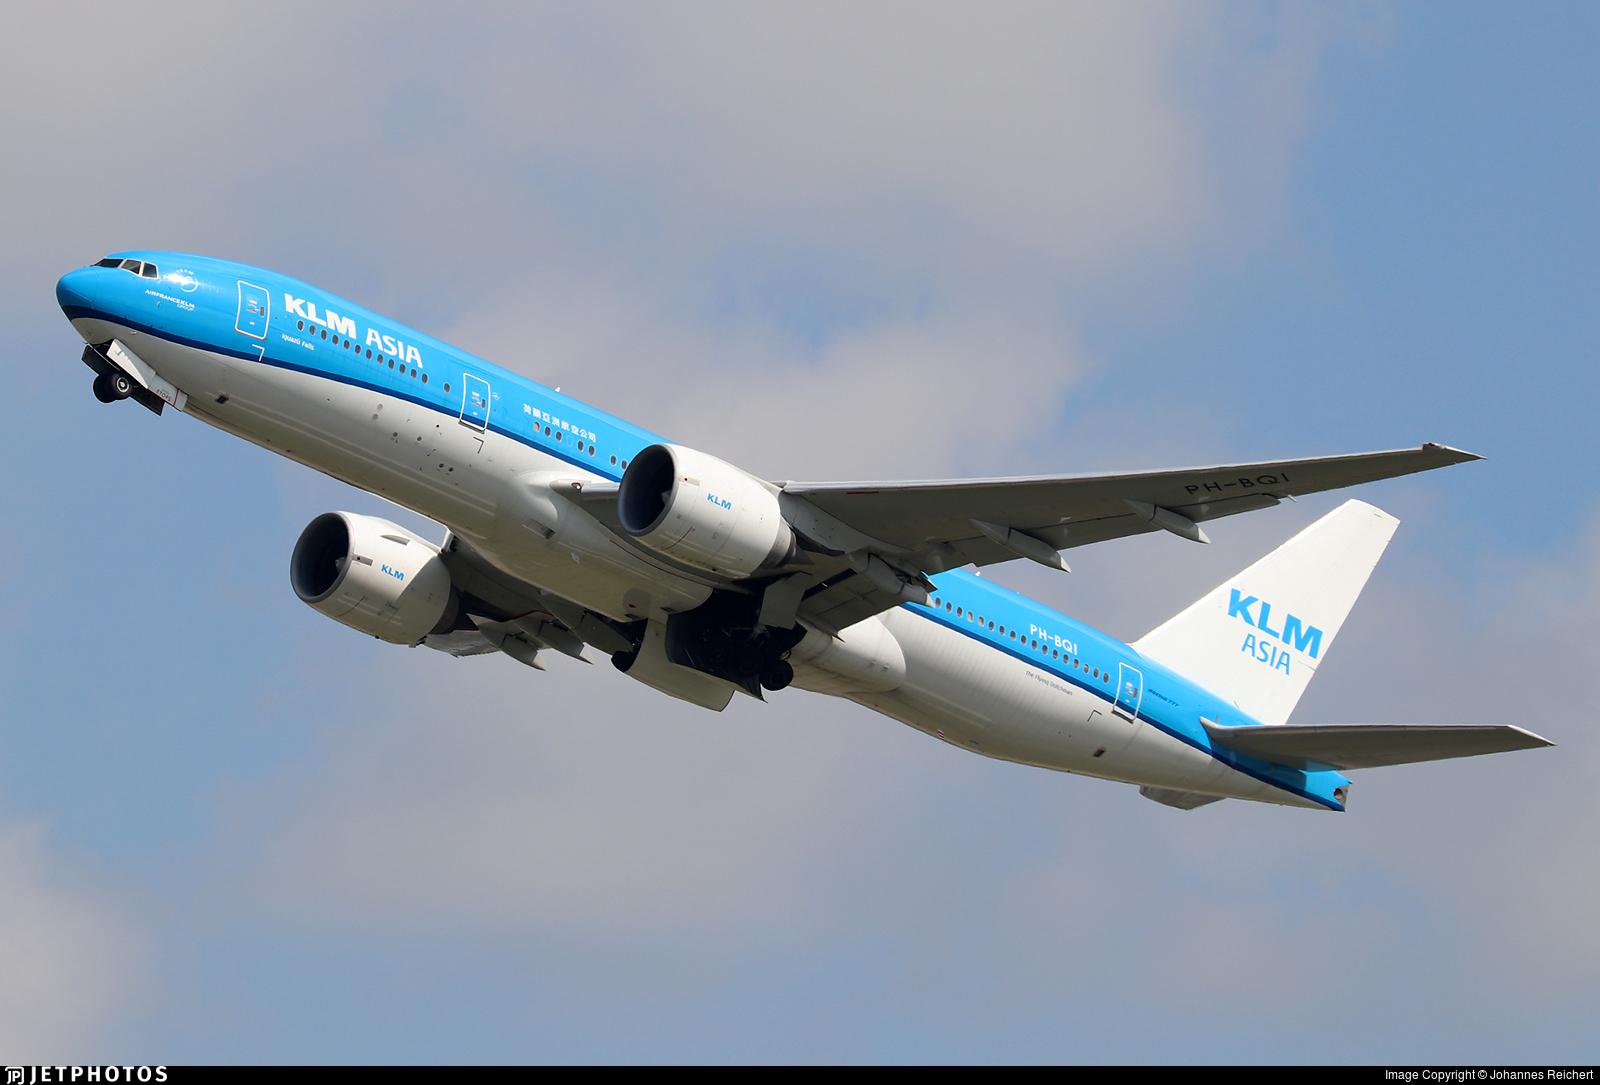 PH-BQI - Boeing 777-206(ER) - KLM Asia